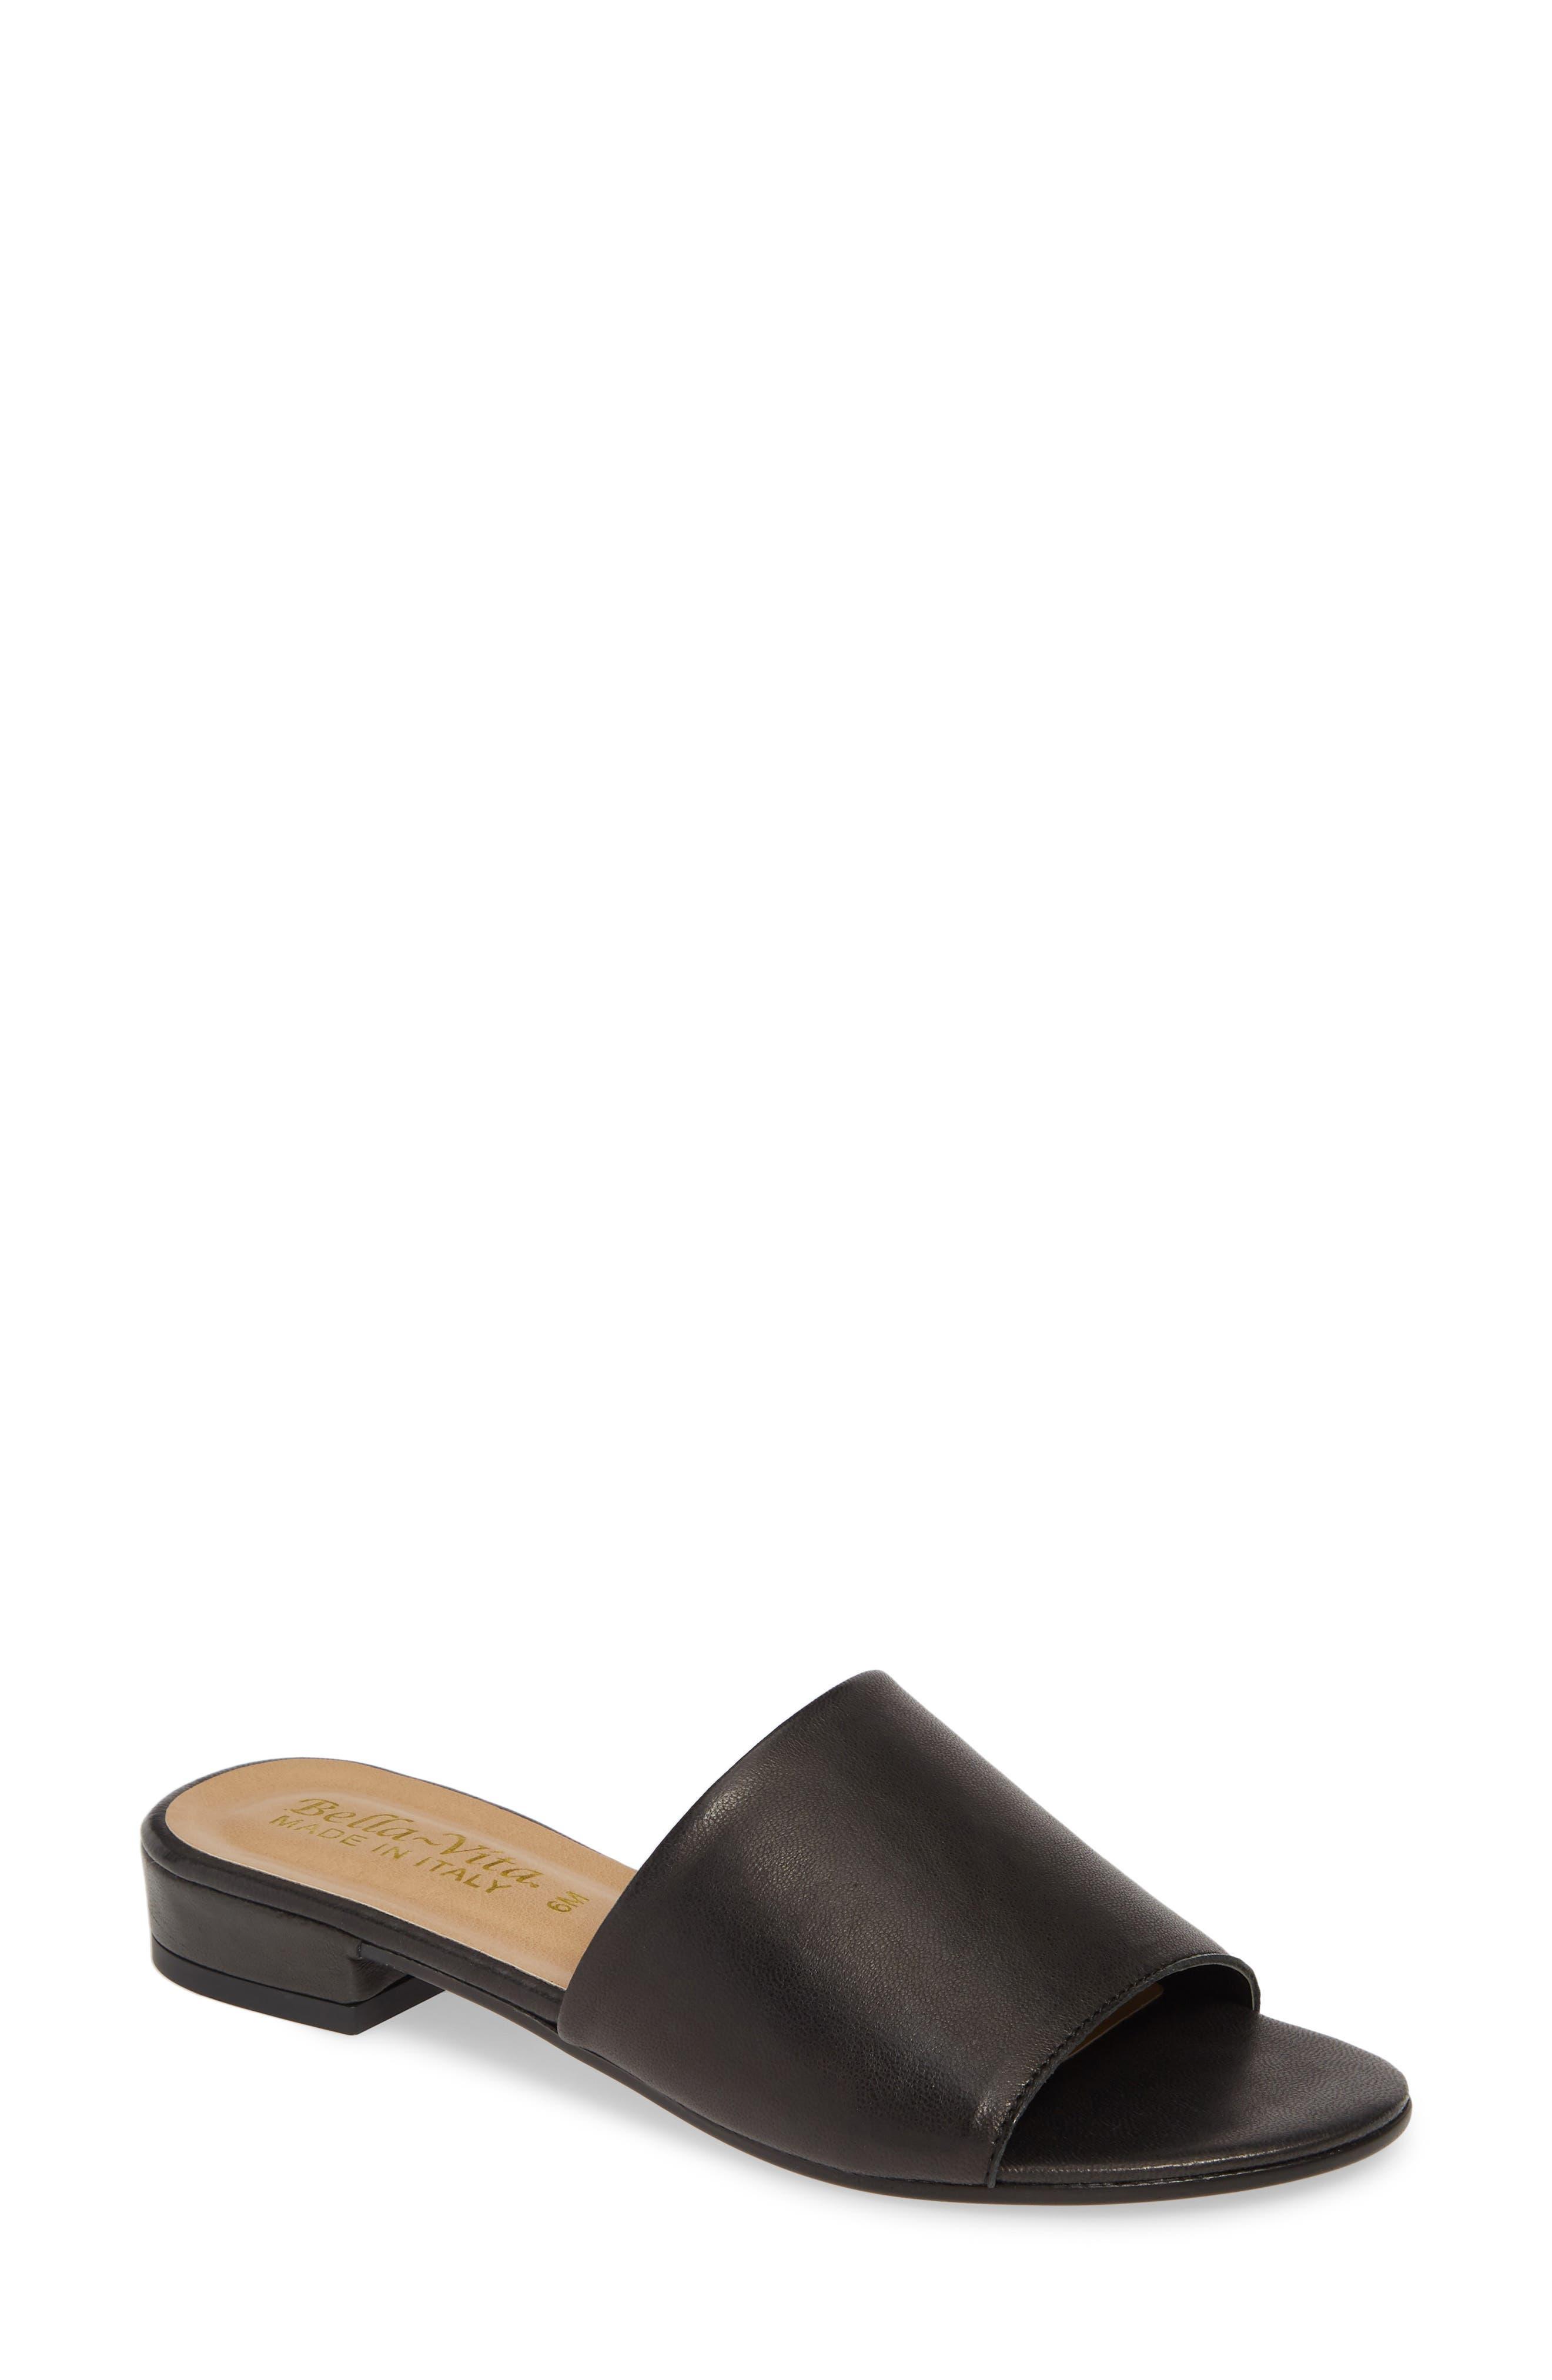 Bella Vita Slide Sandal N - Black